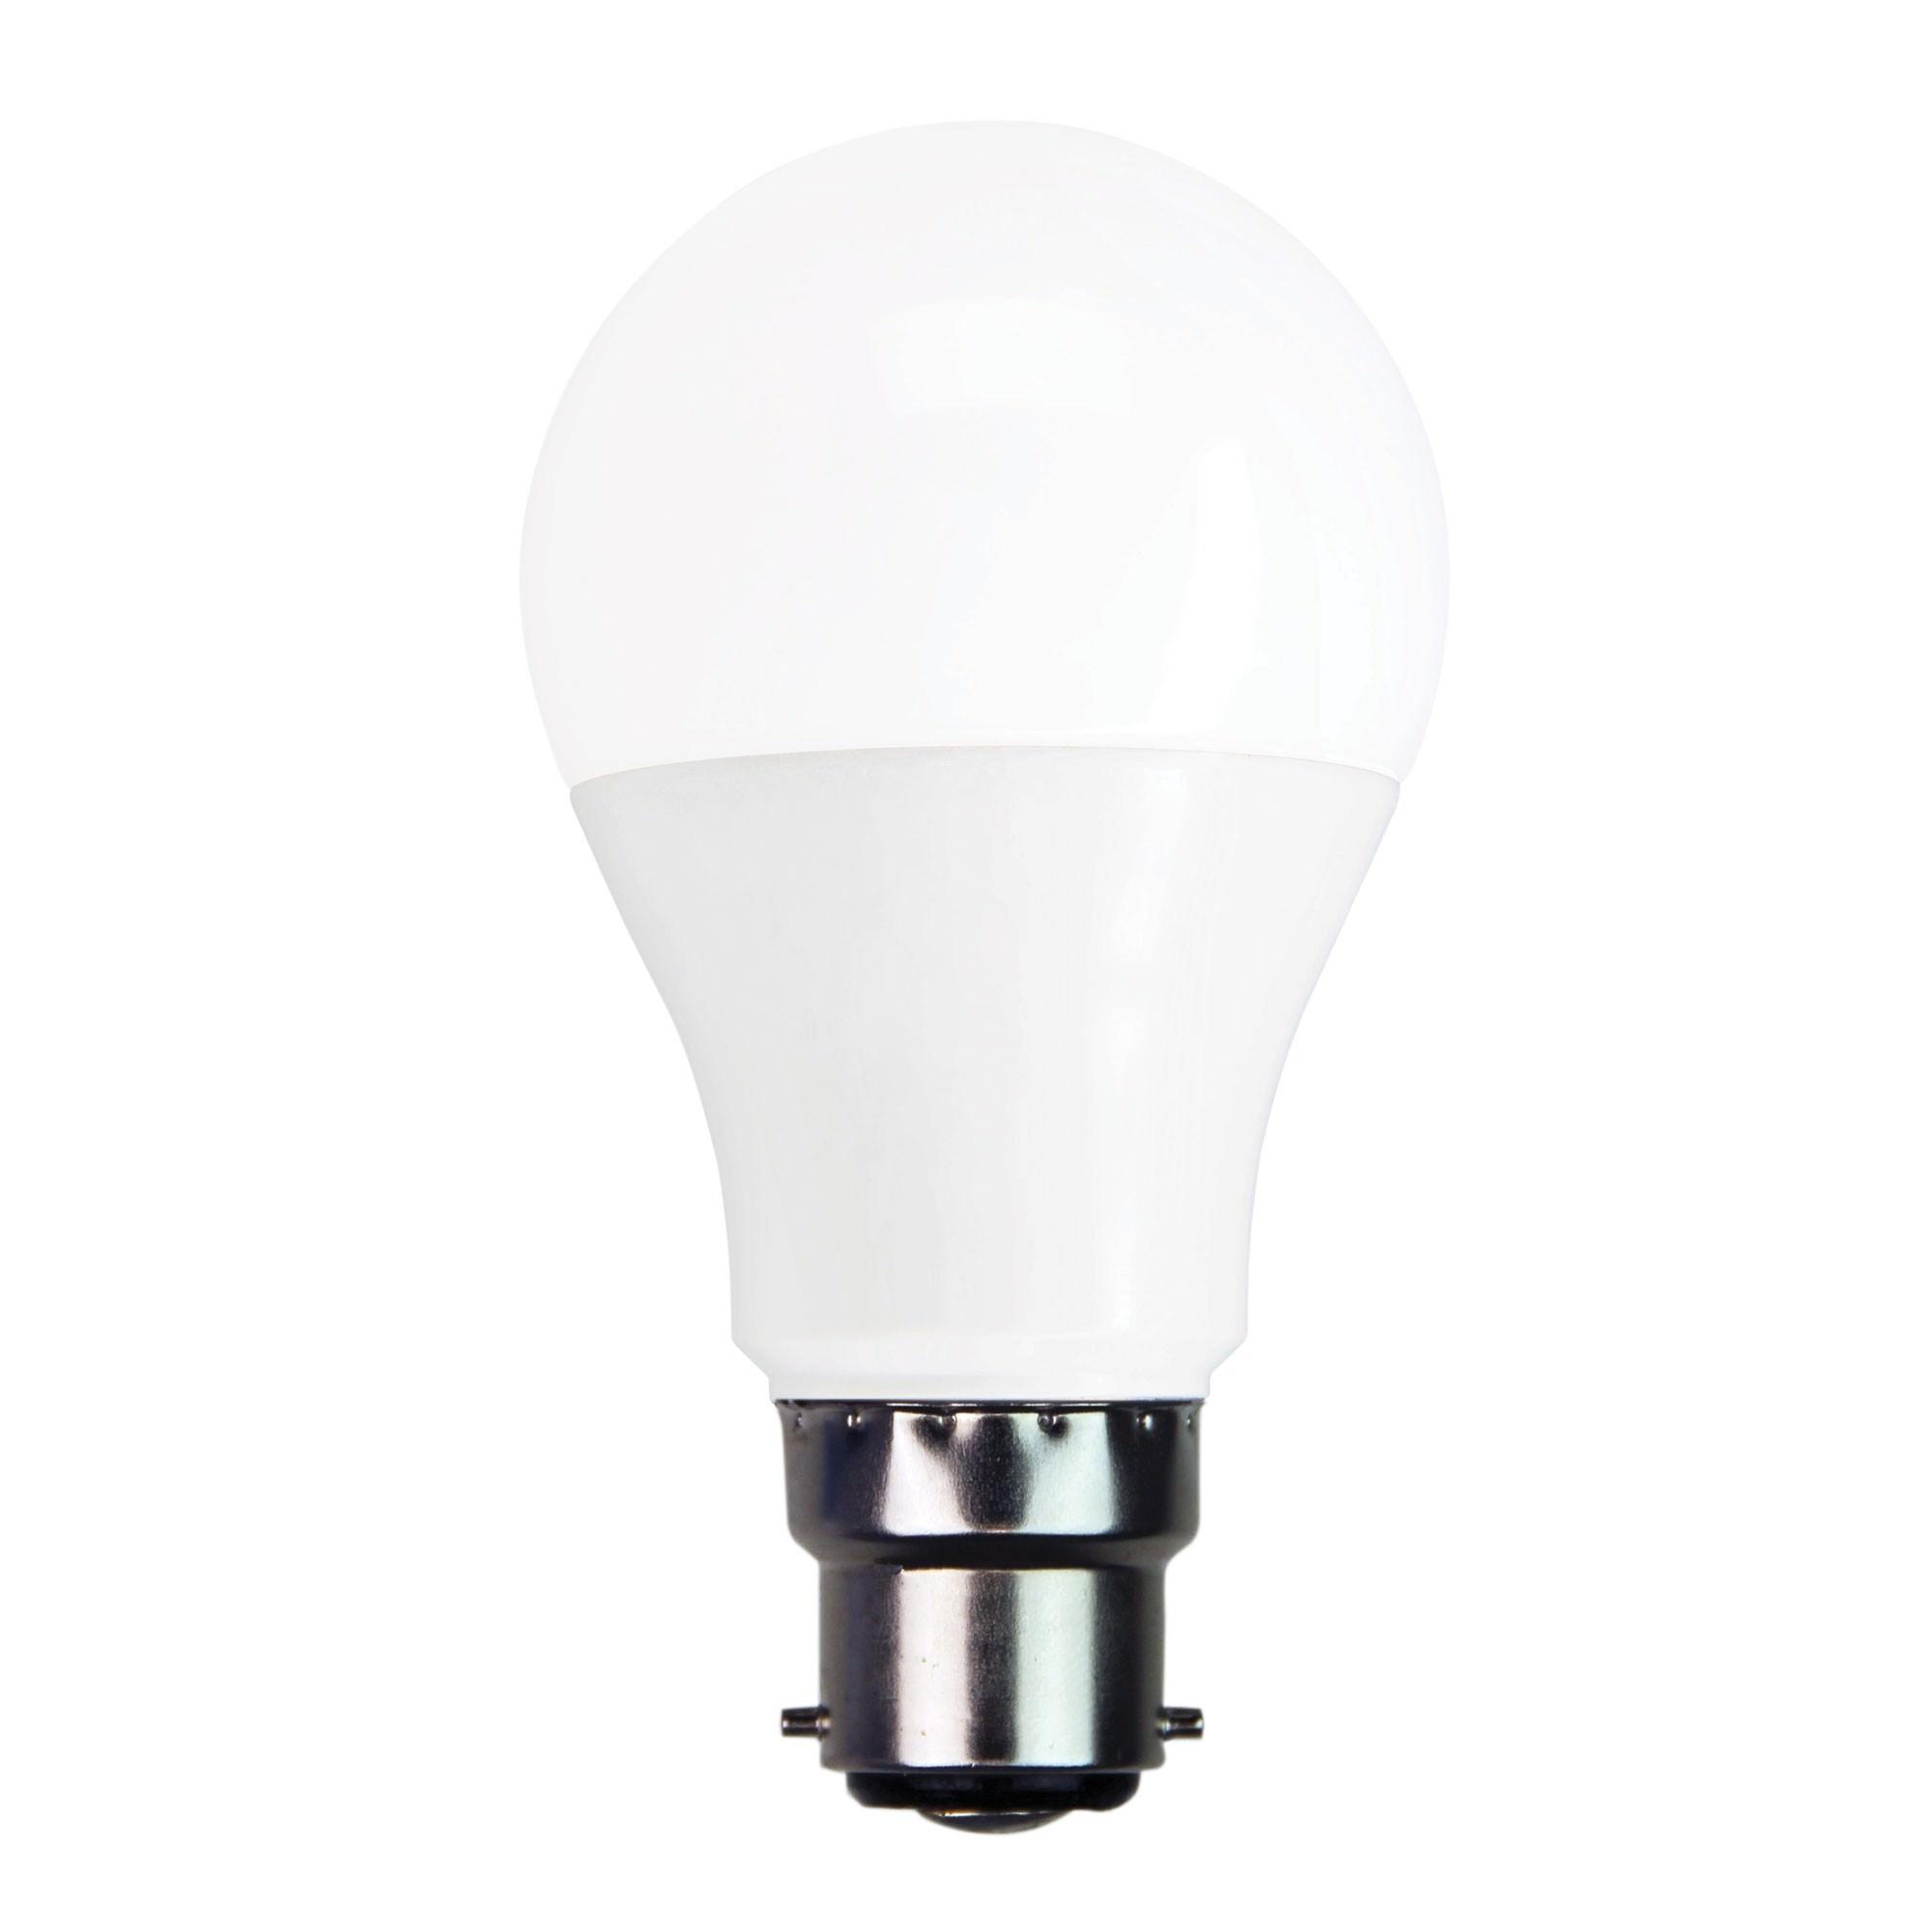 Allume LED Globe, 7W, B22, 3000K, GLS Shape